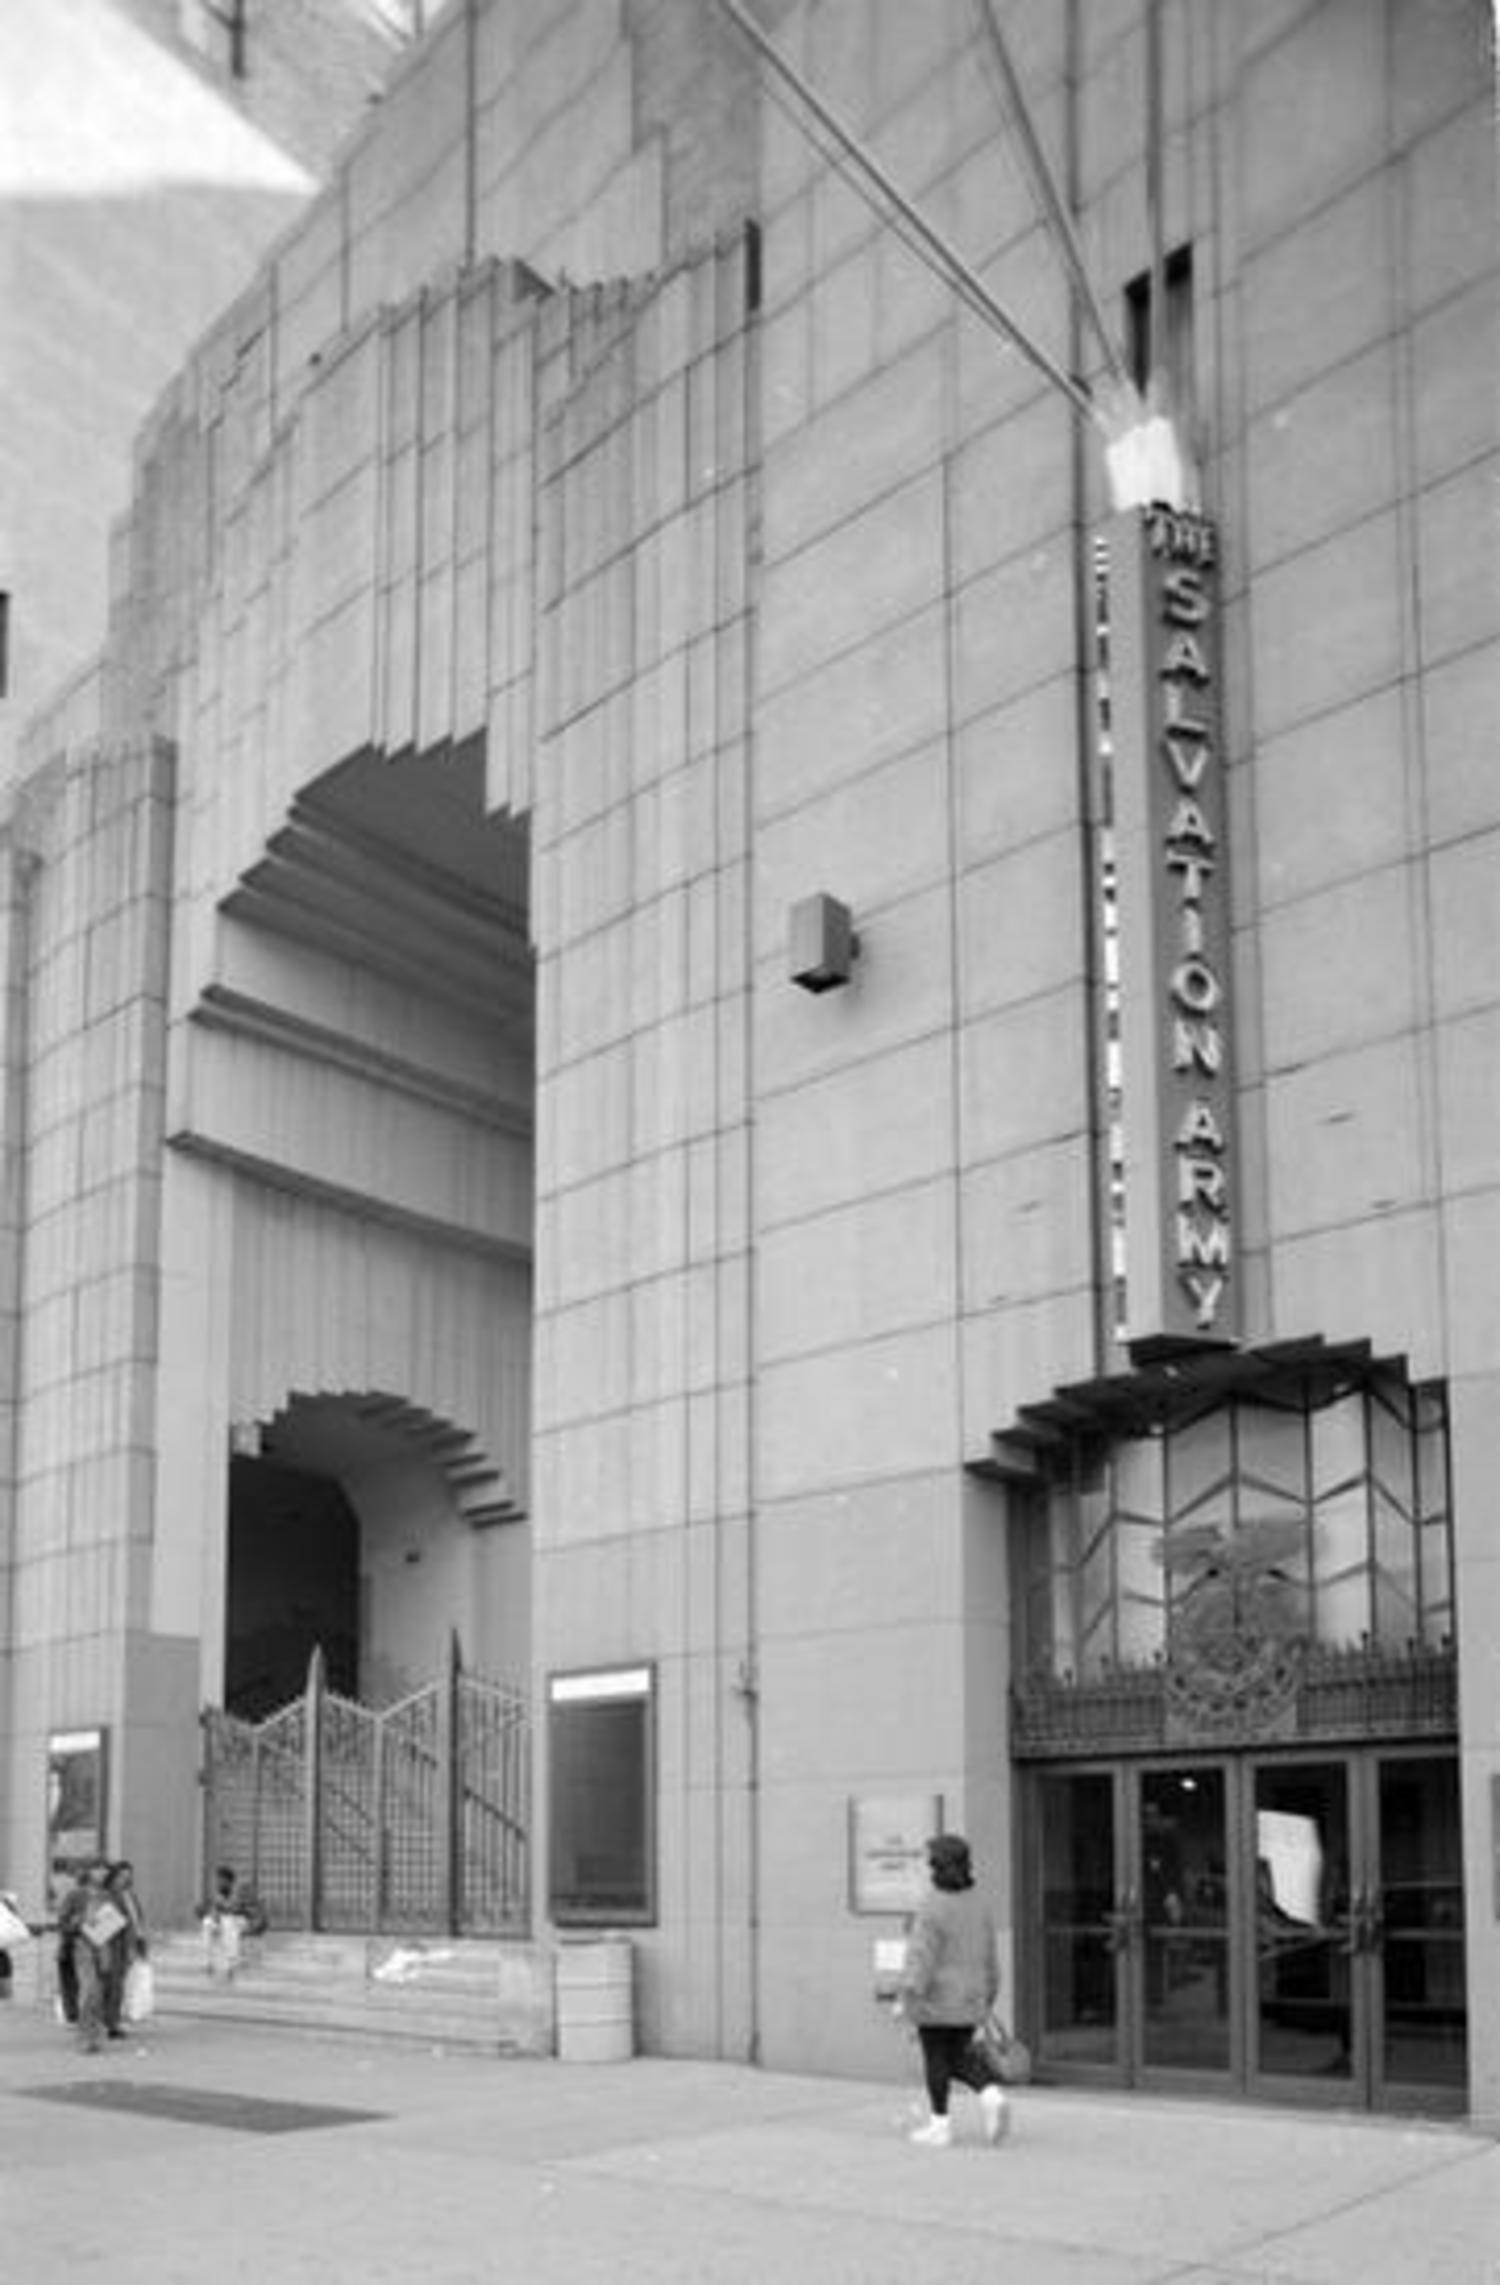 Salvation Army, 14th Street, Manhattan New York